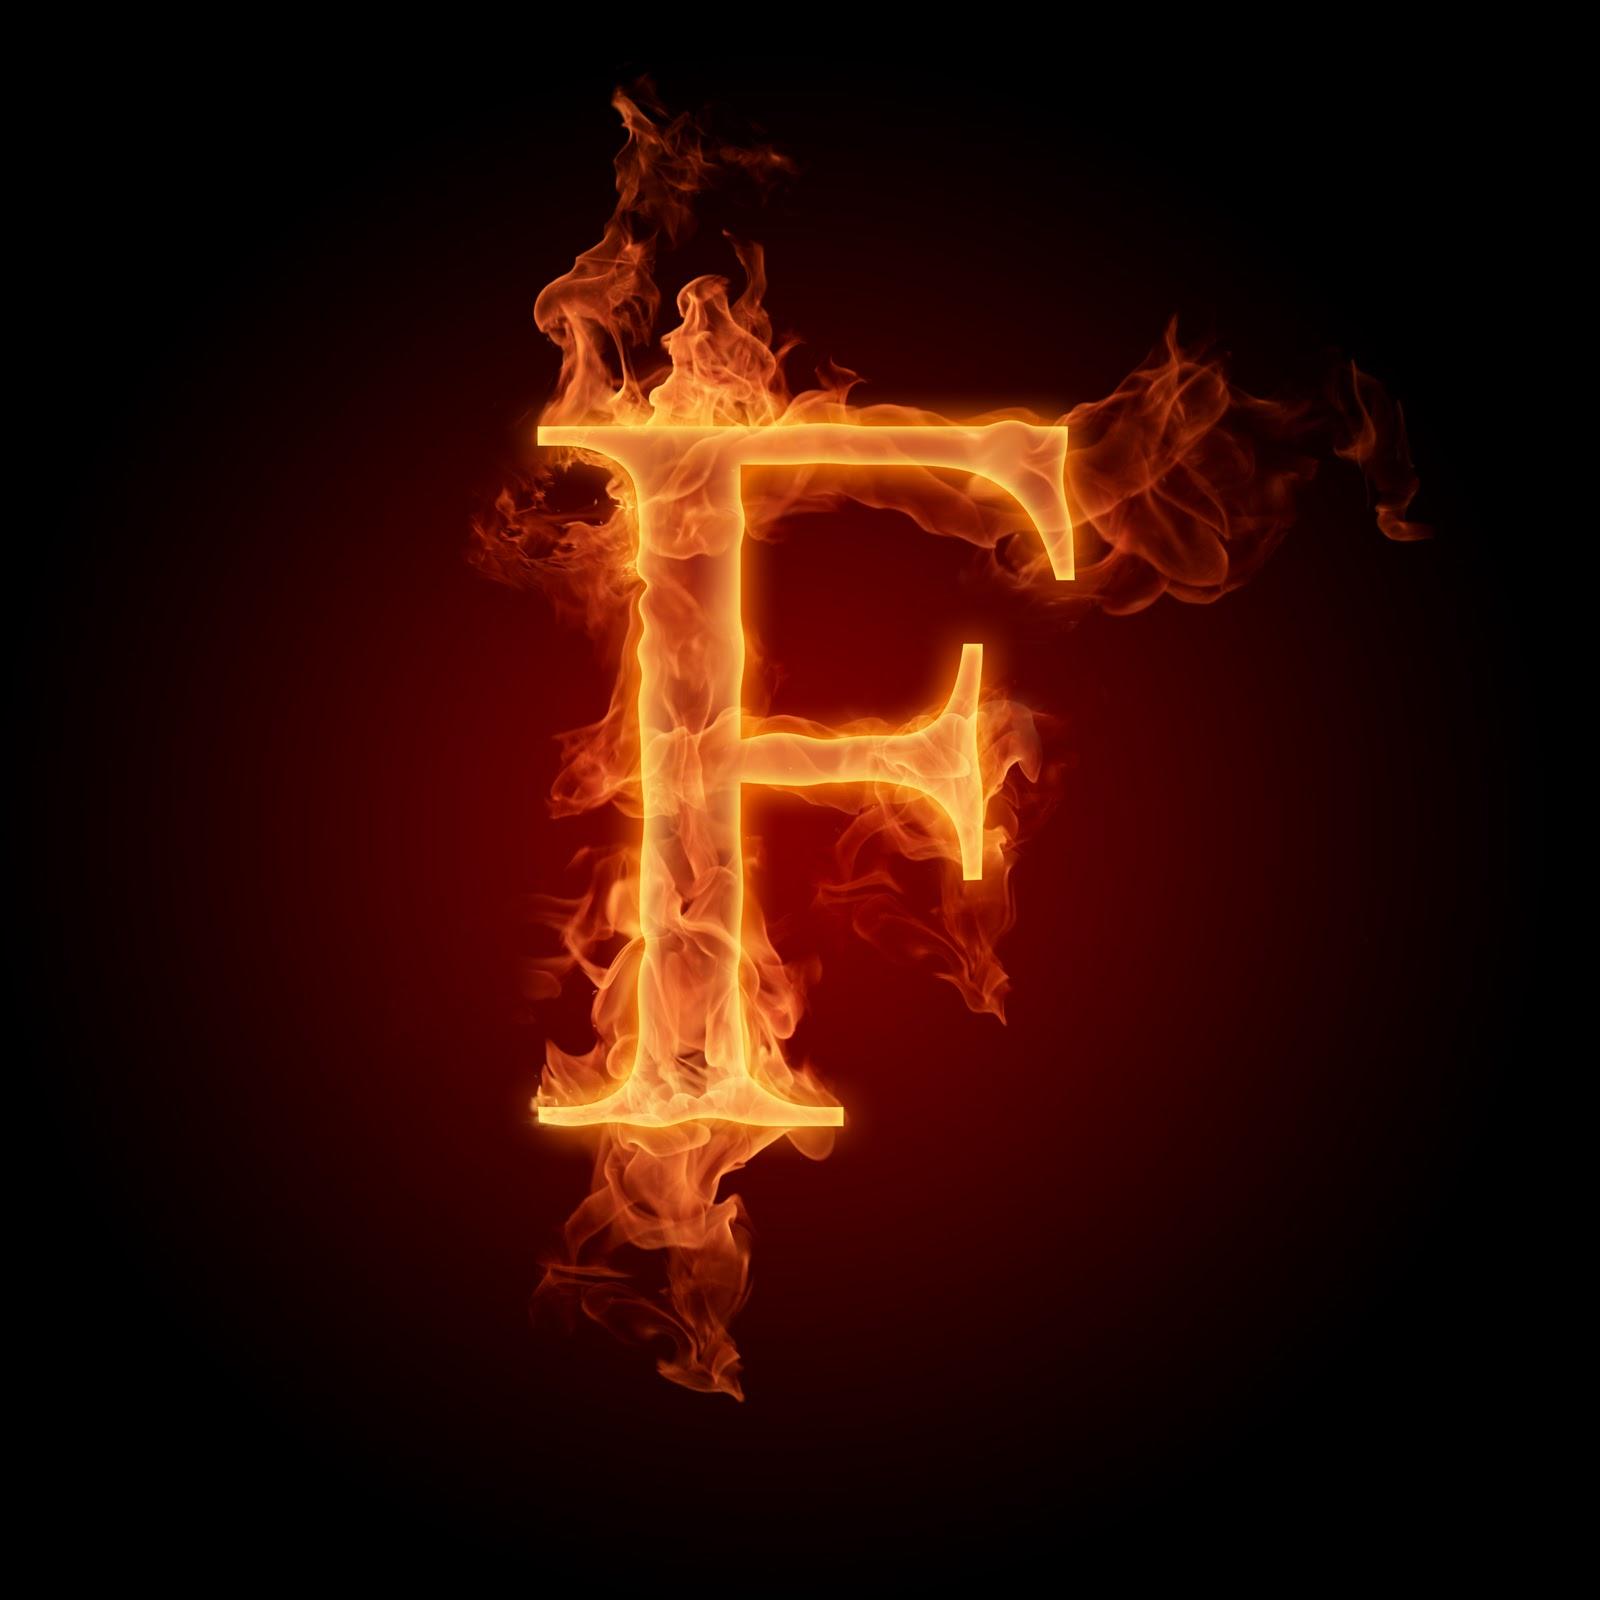 Huruf A Sampai Z Dengan Elemen Api